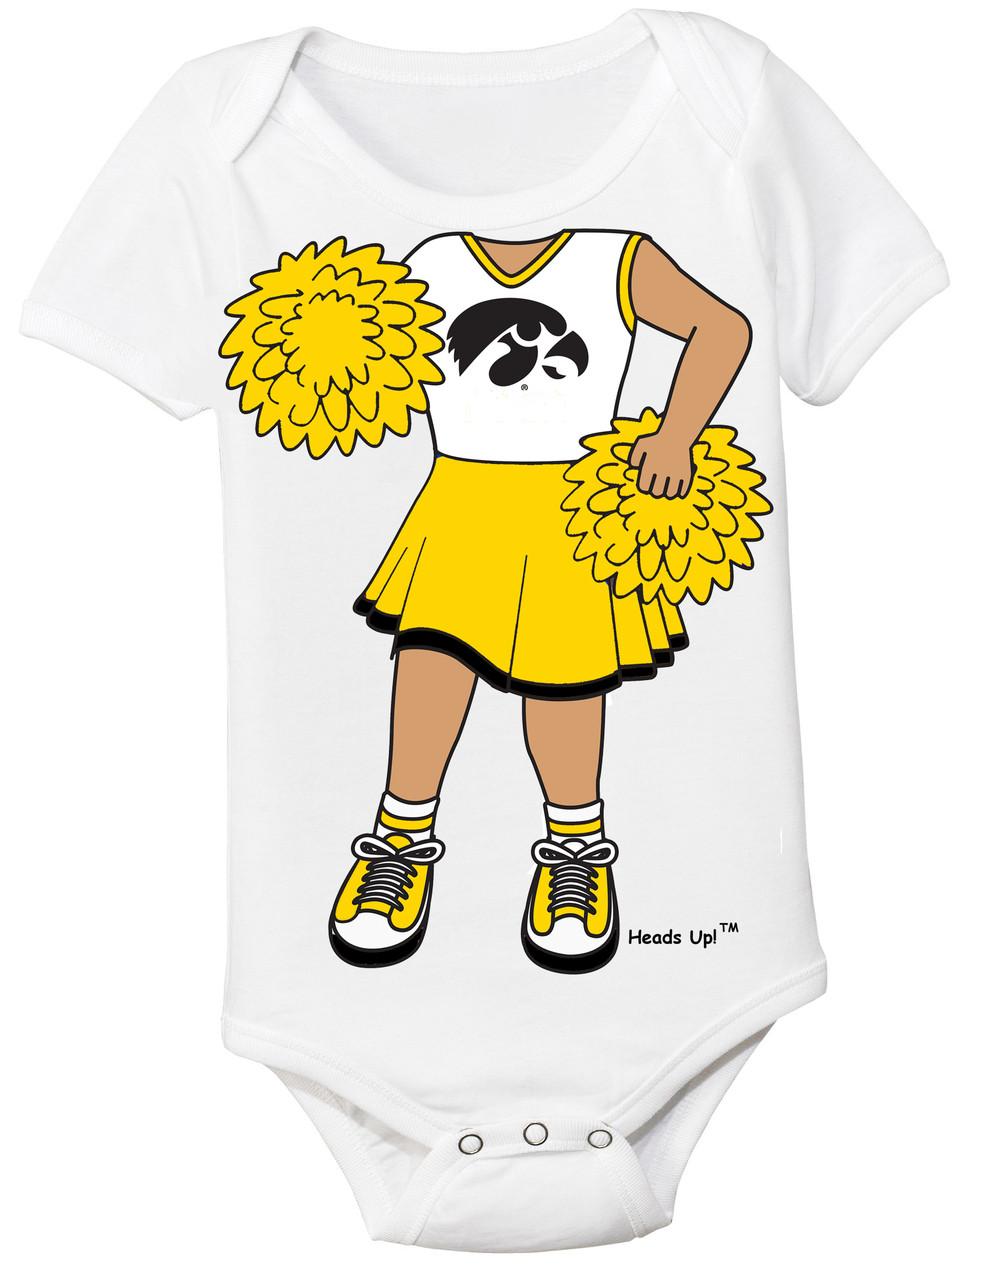 6003363a0 Iowa Hawkeyes Heads Up! Cheerleader Baby Onesie. Loading zoom